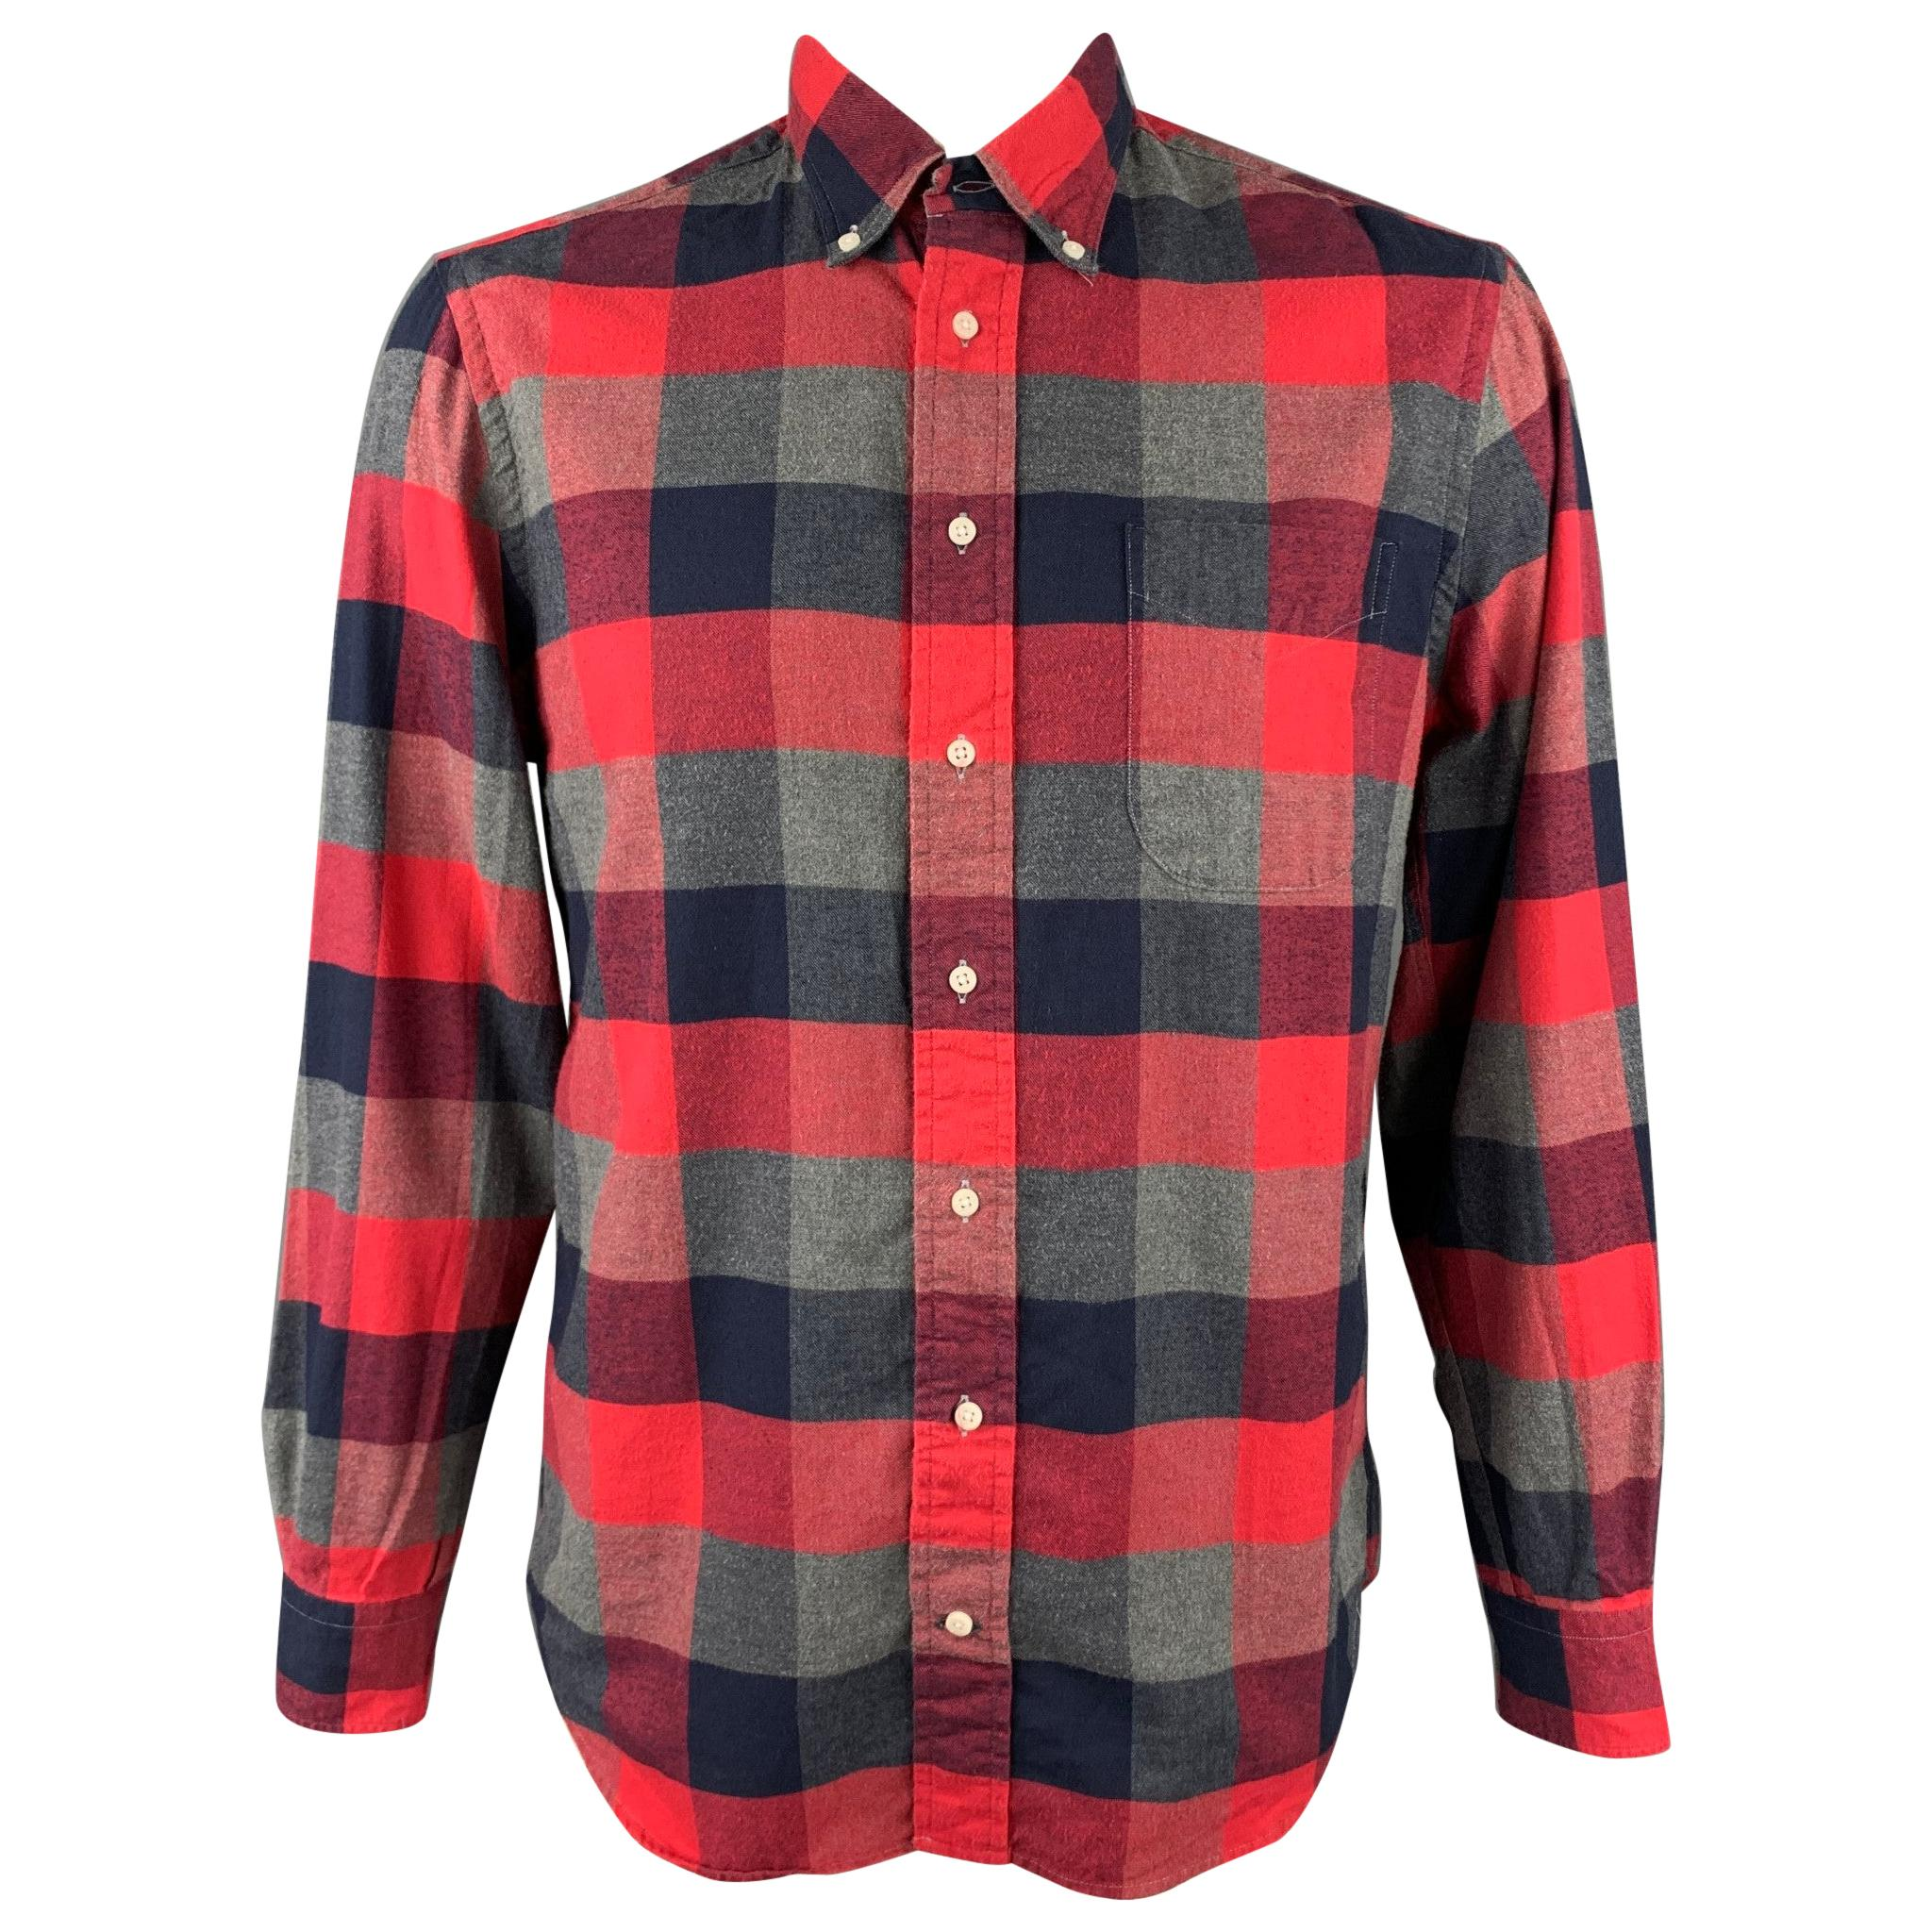 GITMAN VINTAGE Size L Red & Grey Plaid Cotton Long Sleeve Shirt